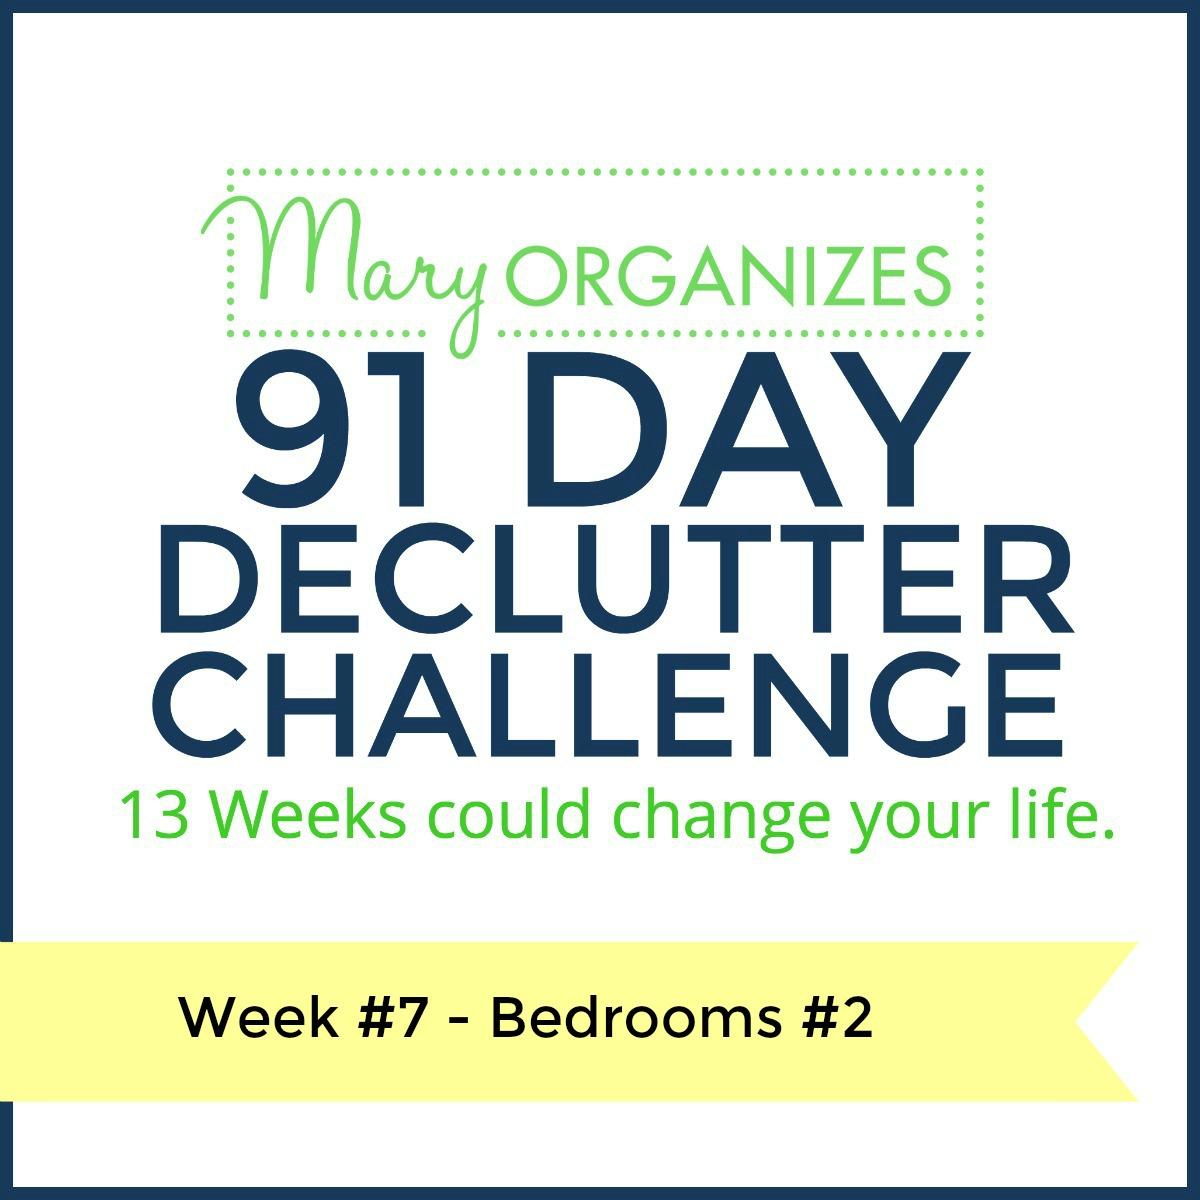 week-7-91-day-declutter-challenge-s